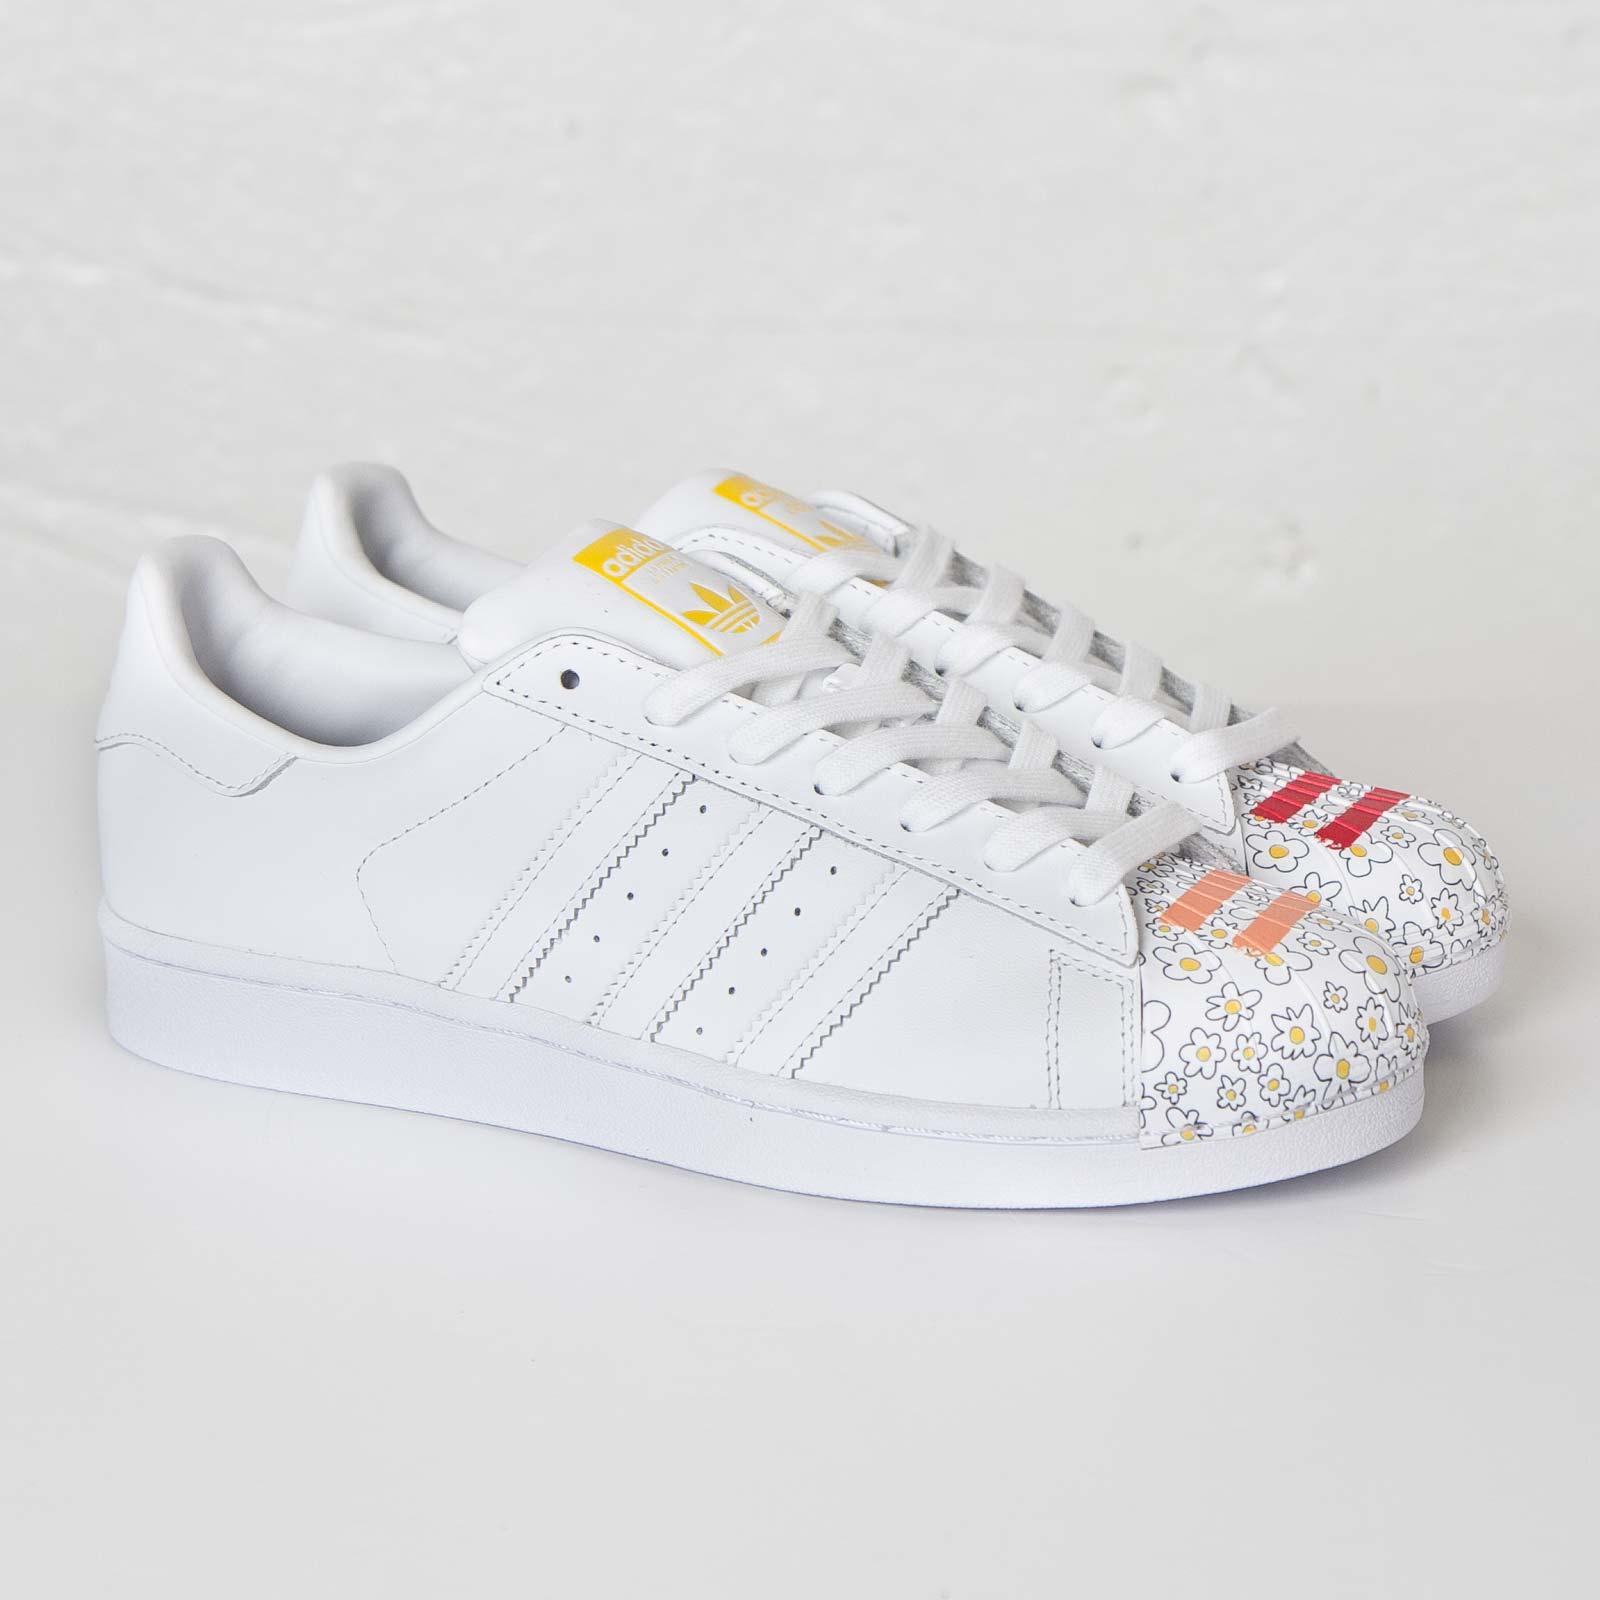 Favorevolmente Alla Moda scarpe Adidas uomo Superstar